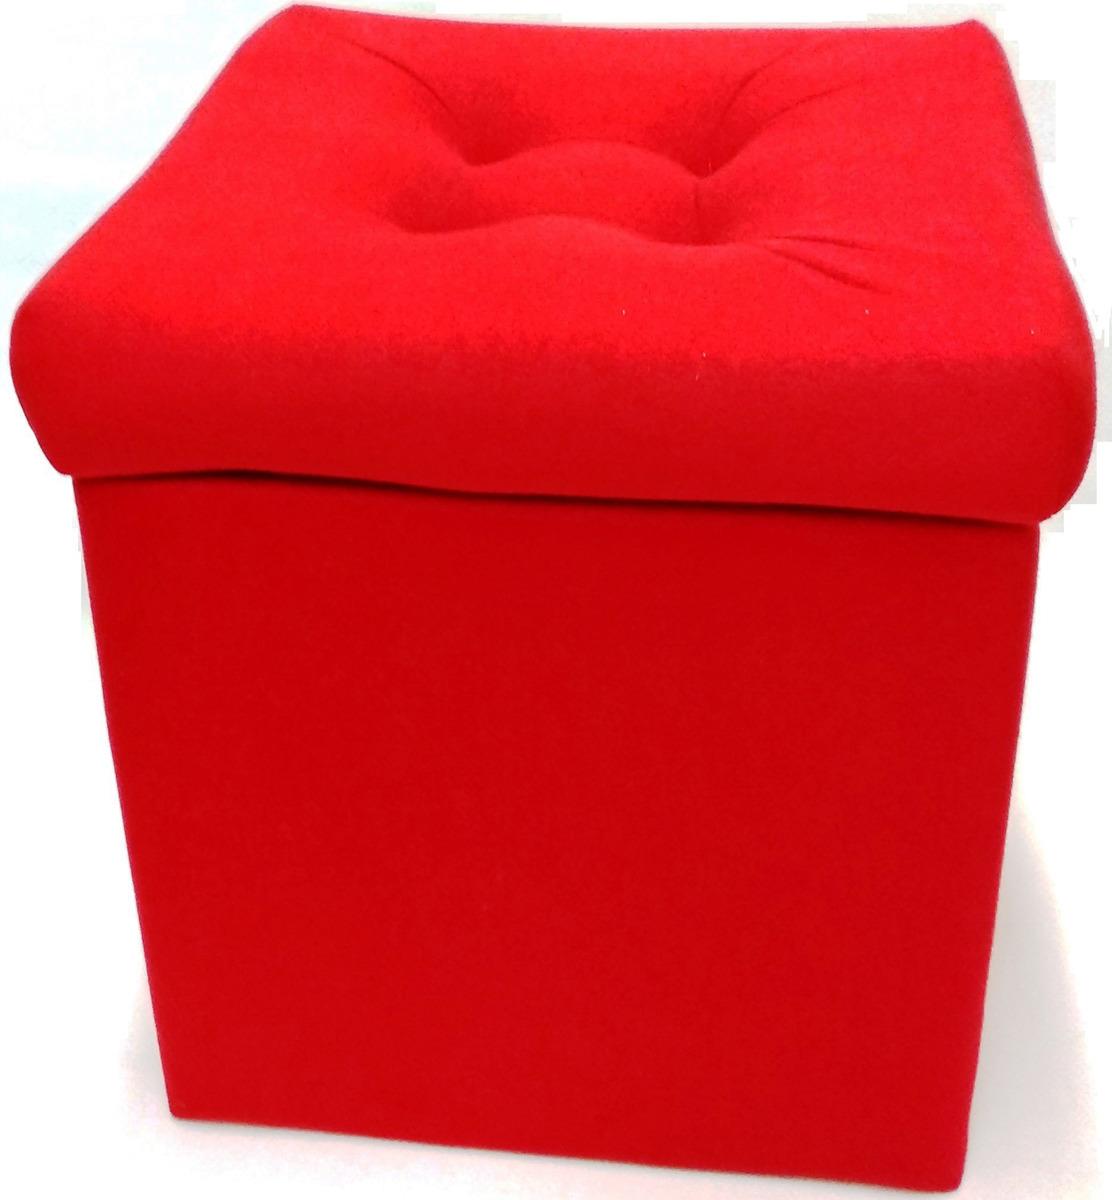 Пуф-короб Auto Premium, с крышкой, 57551, красный, 38 х 38 х 38 см пуф короб для хранения homemaster париж 76 х 38 х 38 см